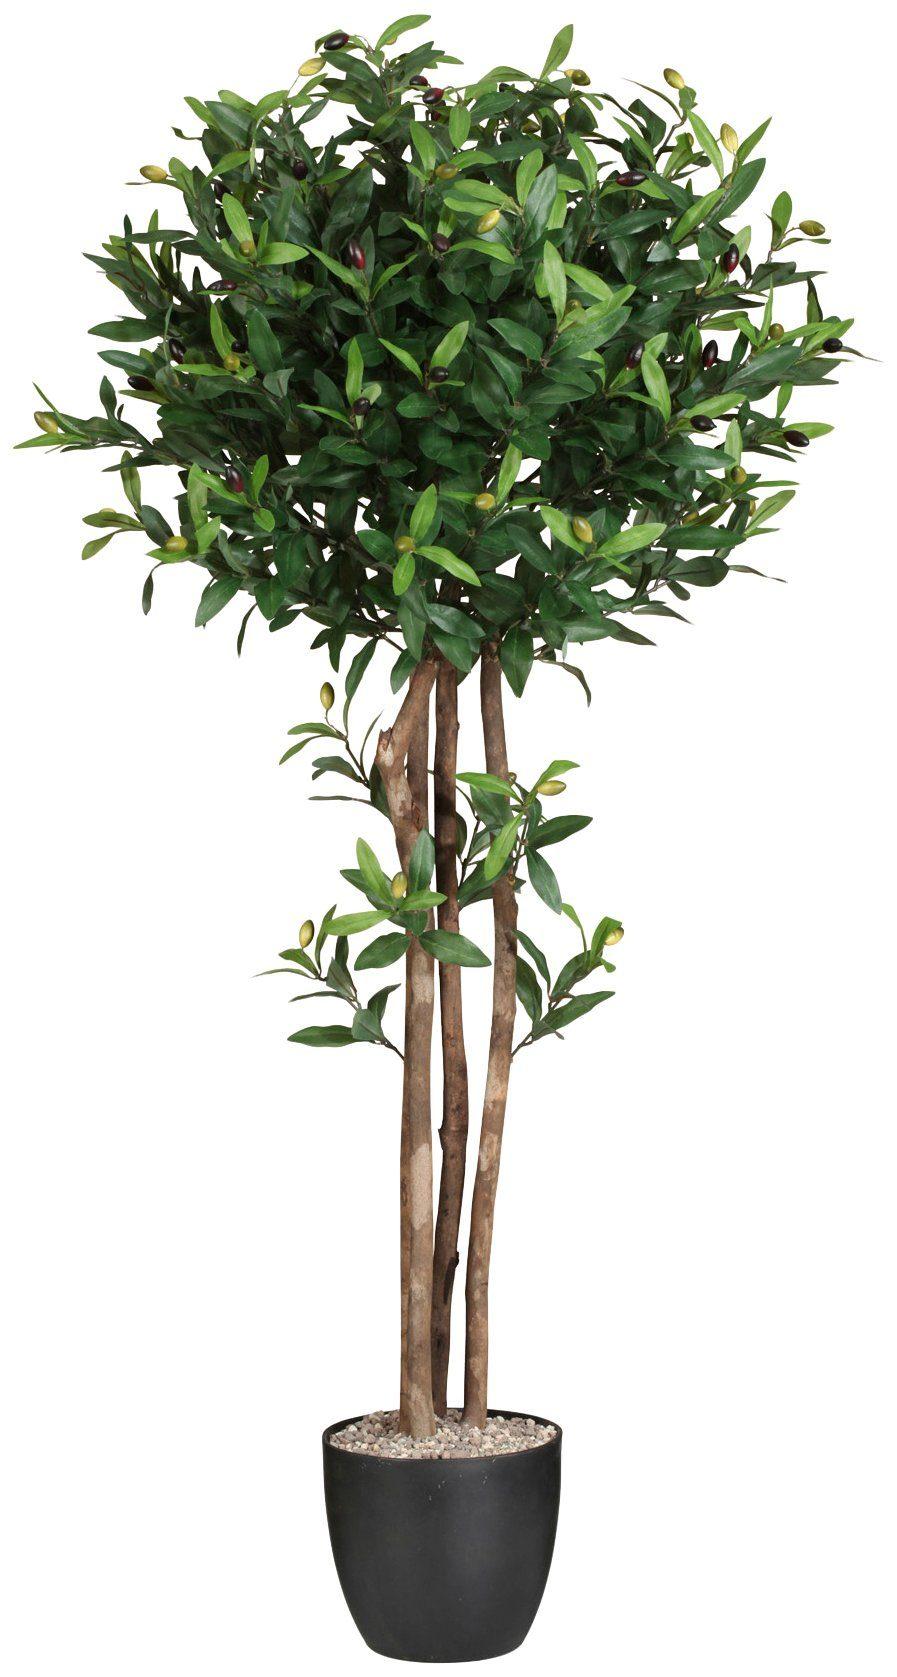 Kunstpflanze »Olivenkugelbaum«, im Kunststofftopf, H: 120 cm